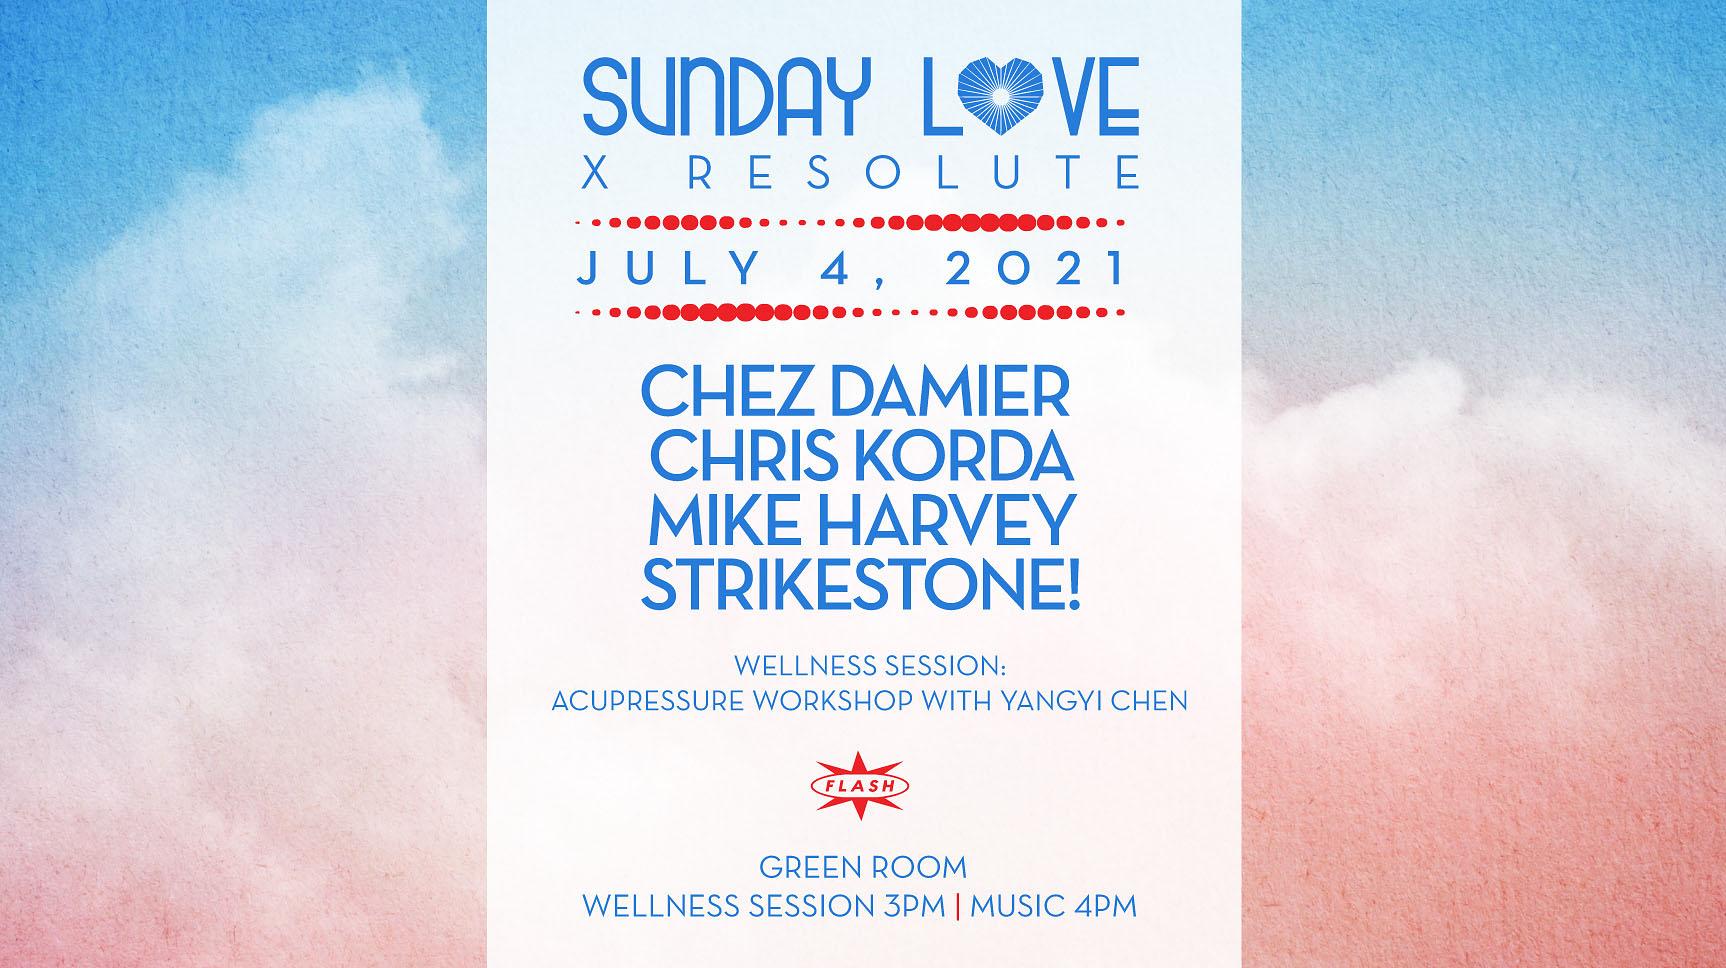 Sunday Love x Resolute 4th of July: Chez Damier - Chris Korda